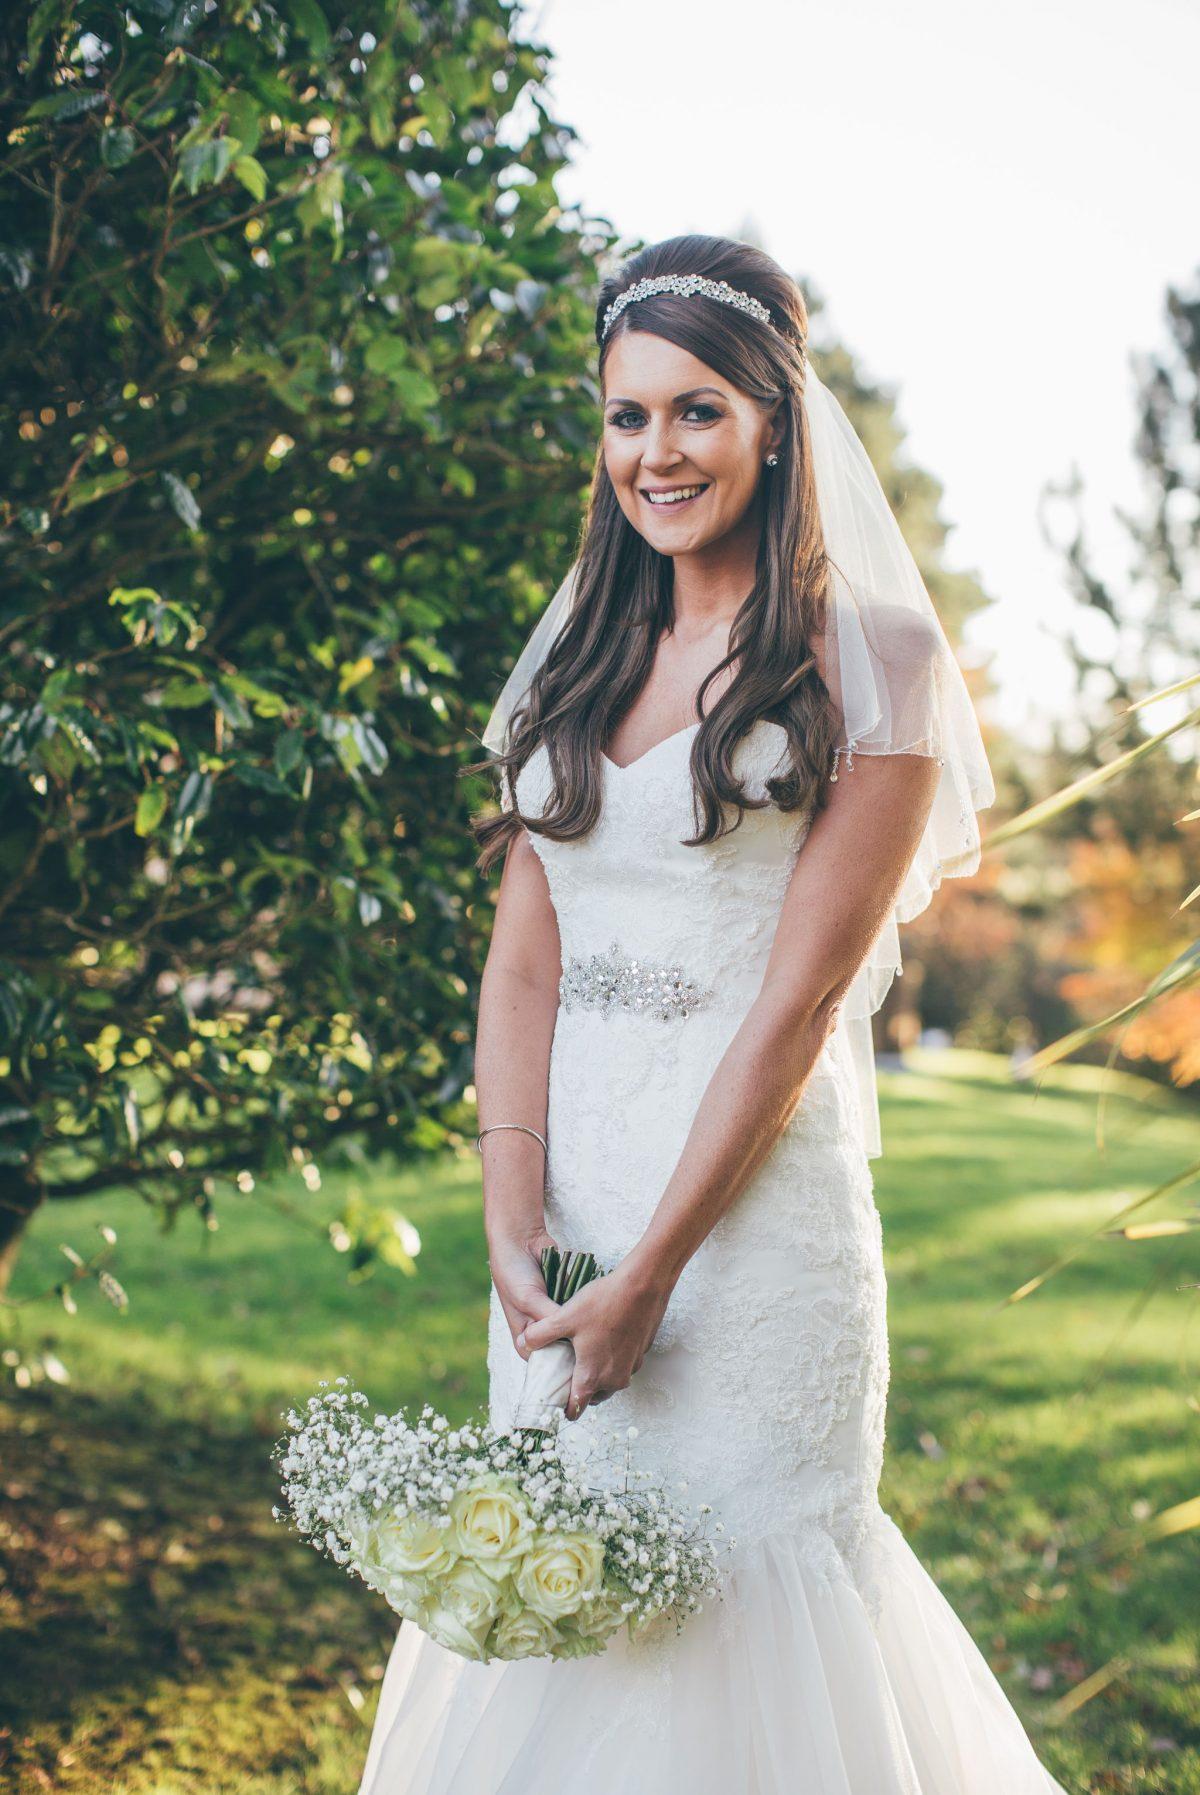 welsh_wedding_photographer_rachel_lambert_photography_decourceys_cardiff_rhiannon_gavin_ 54